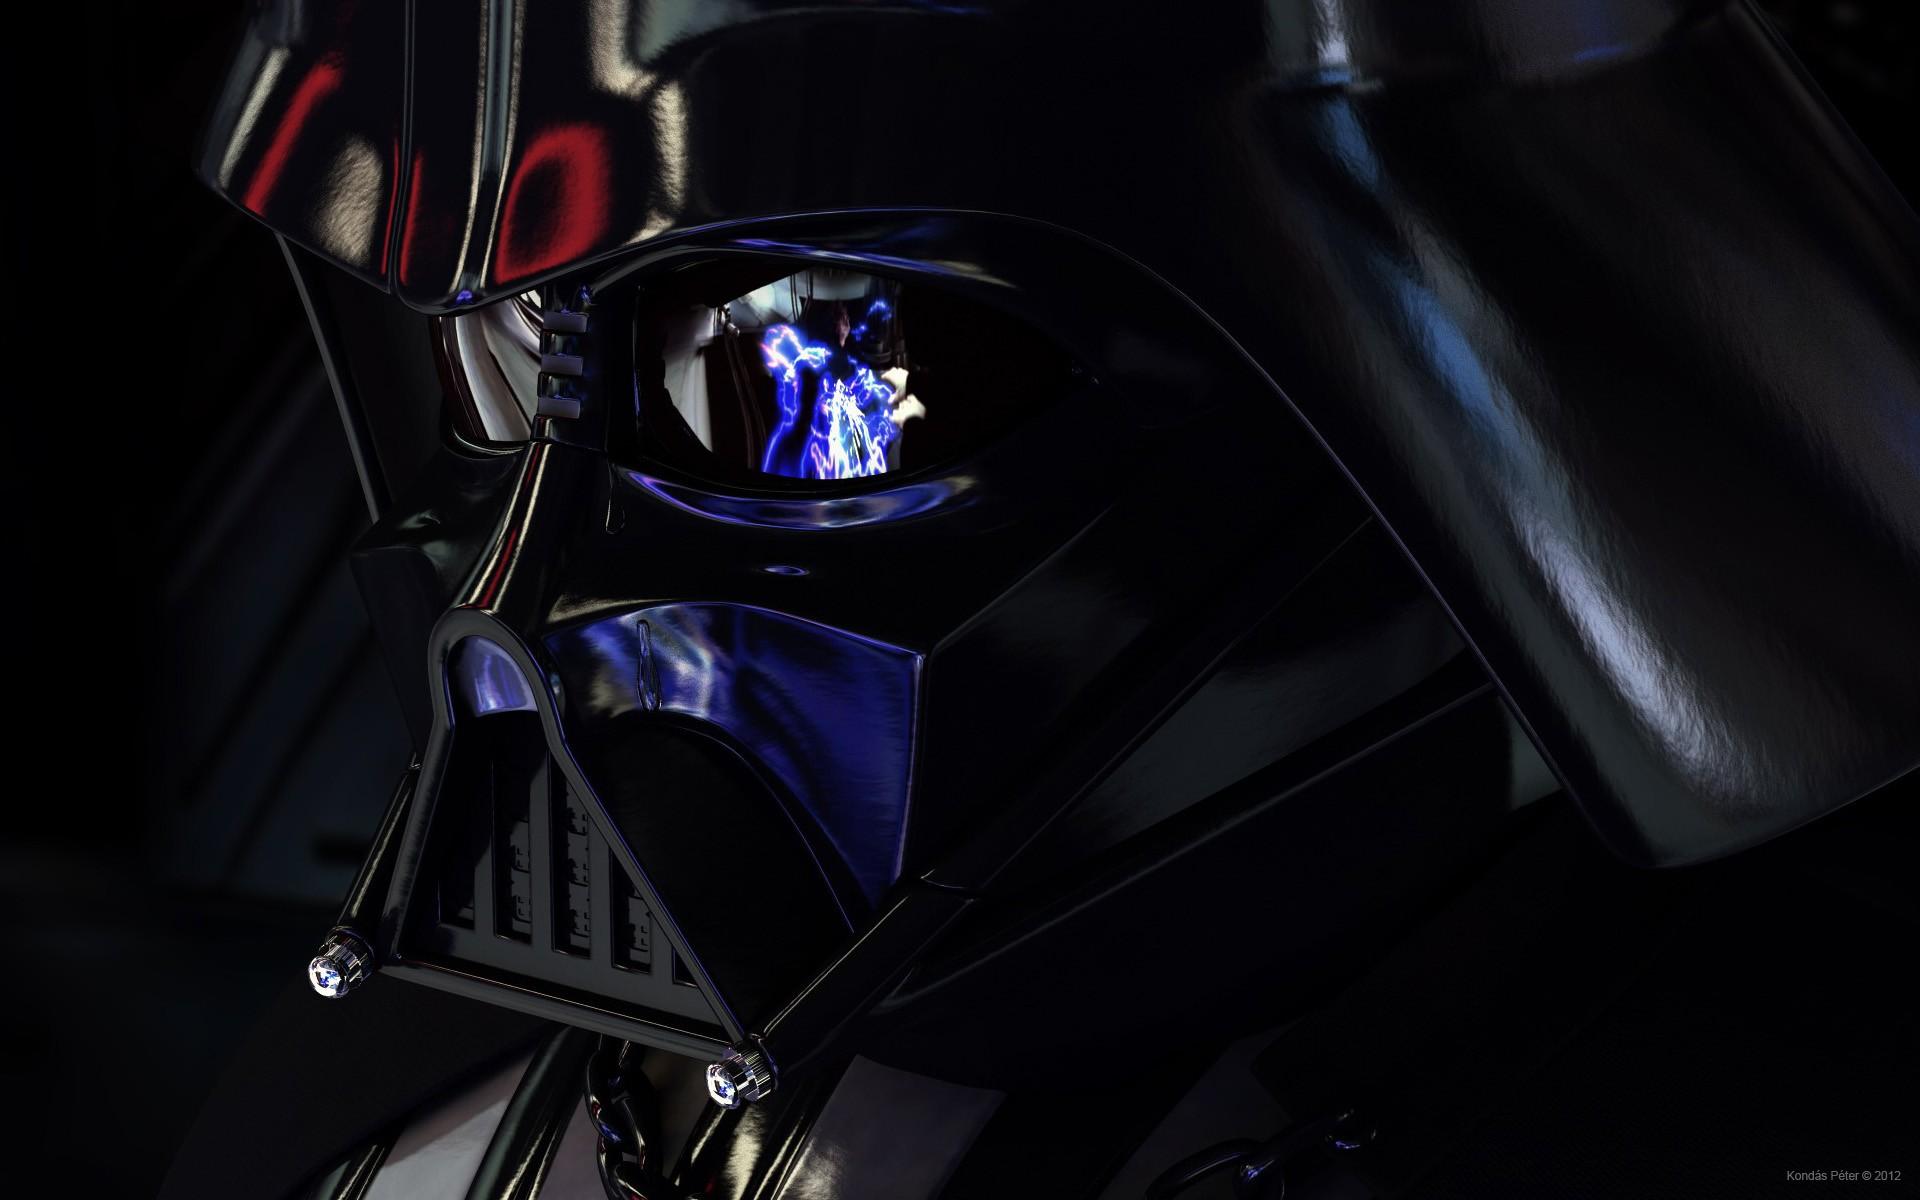 Fondo Casco de Darth Vader - Rincon Util